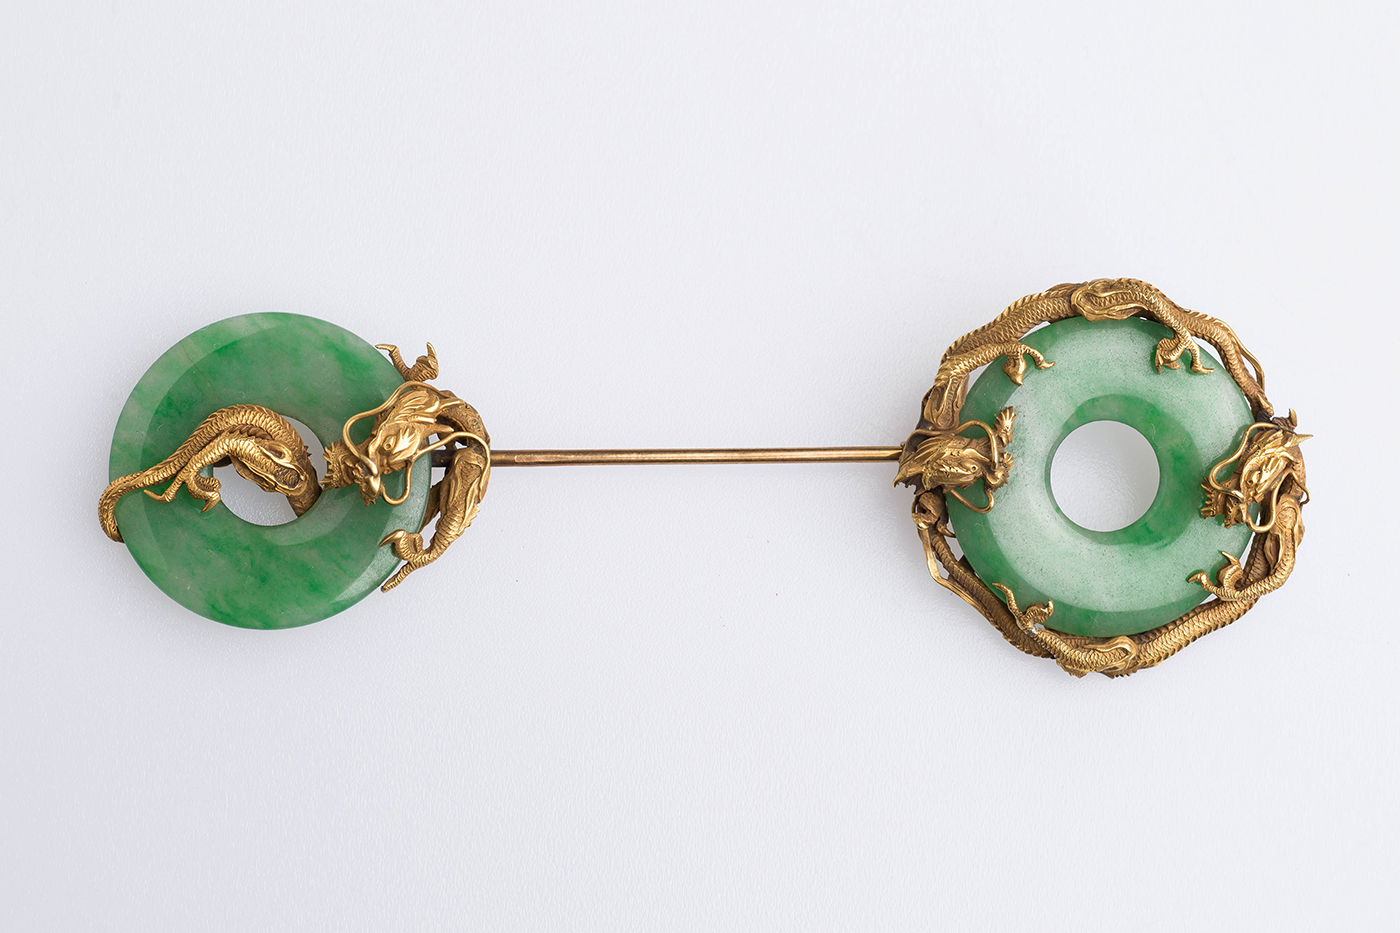 Jade broach